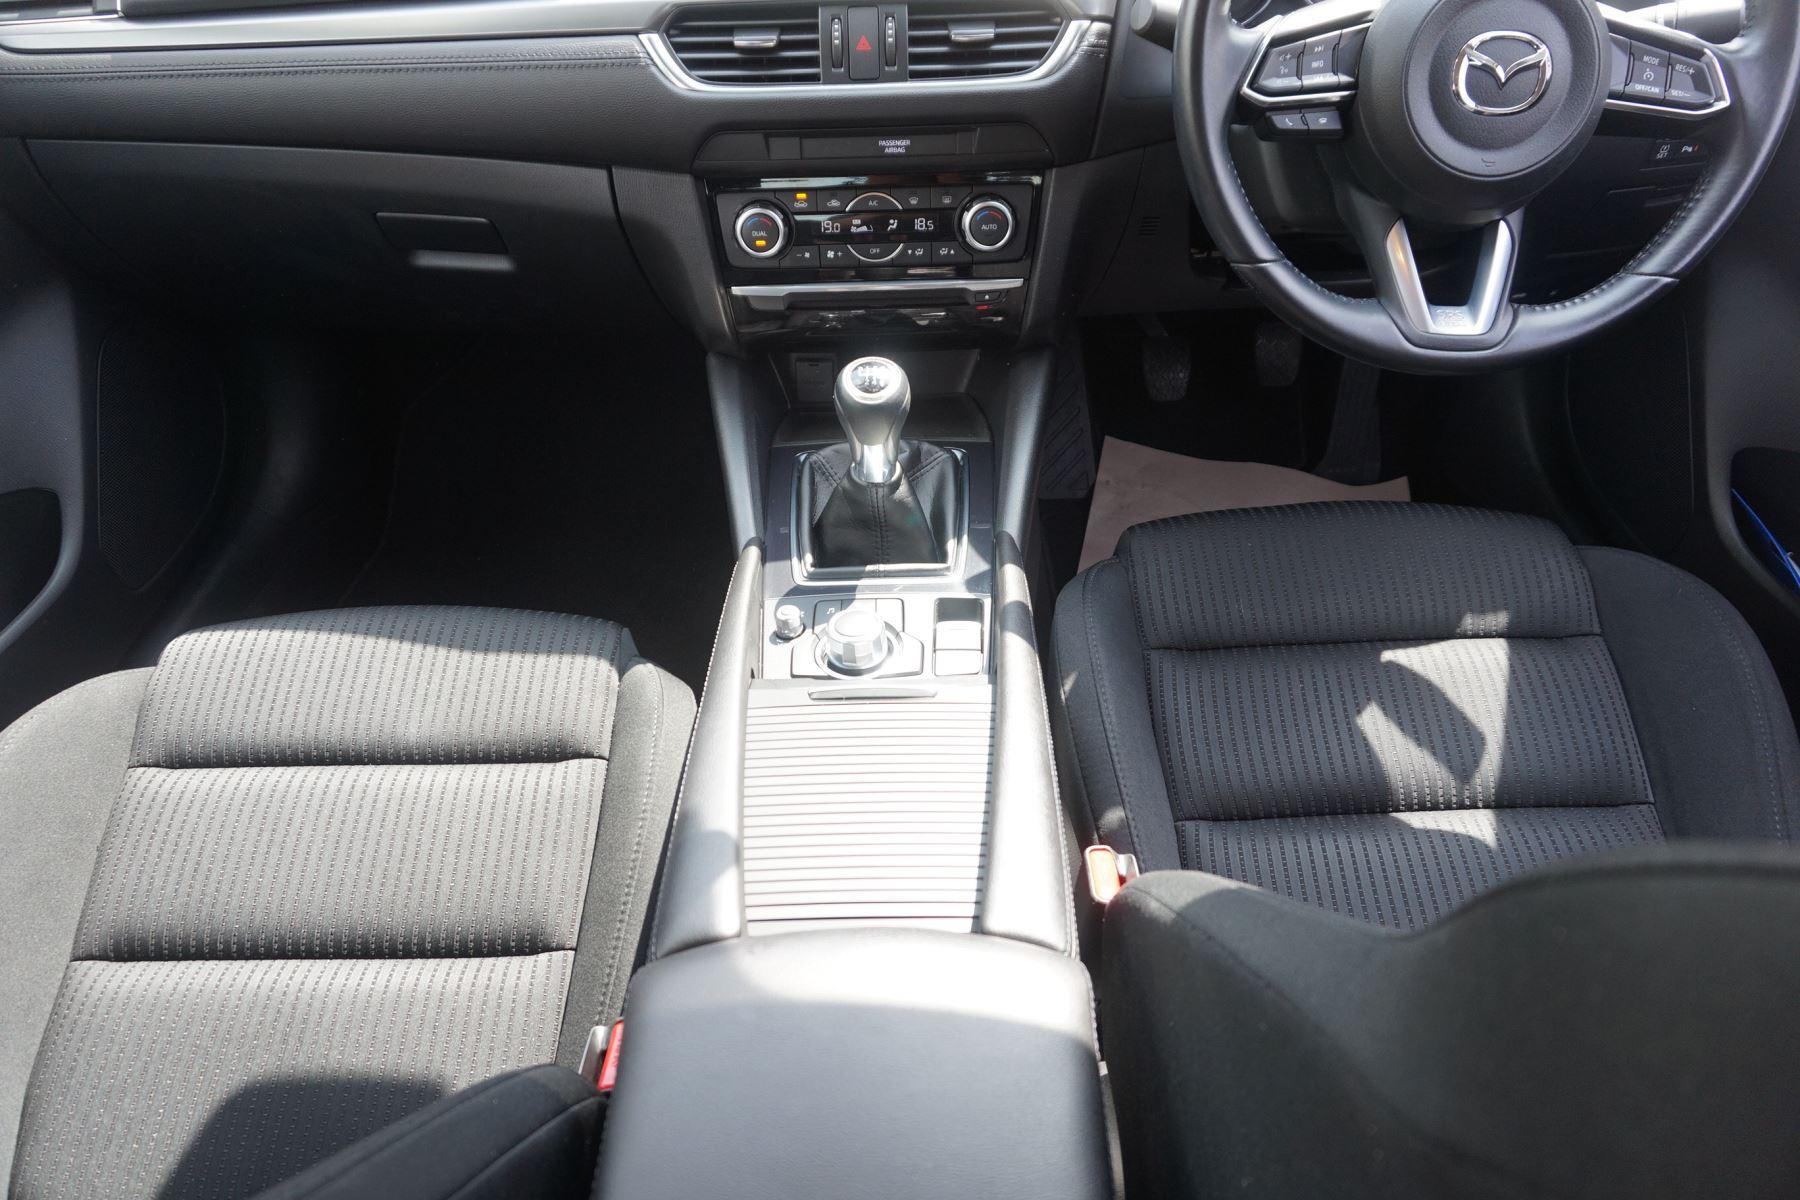 Mazda 6 2.2d SE-L Nav 4dr image 14